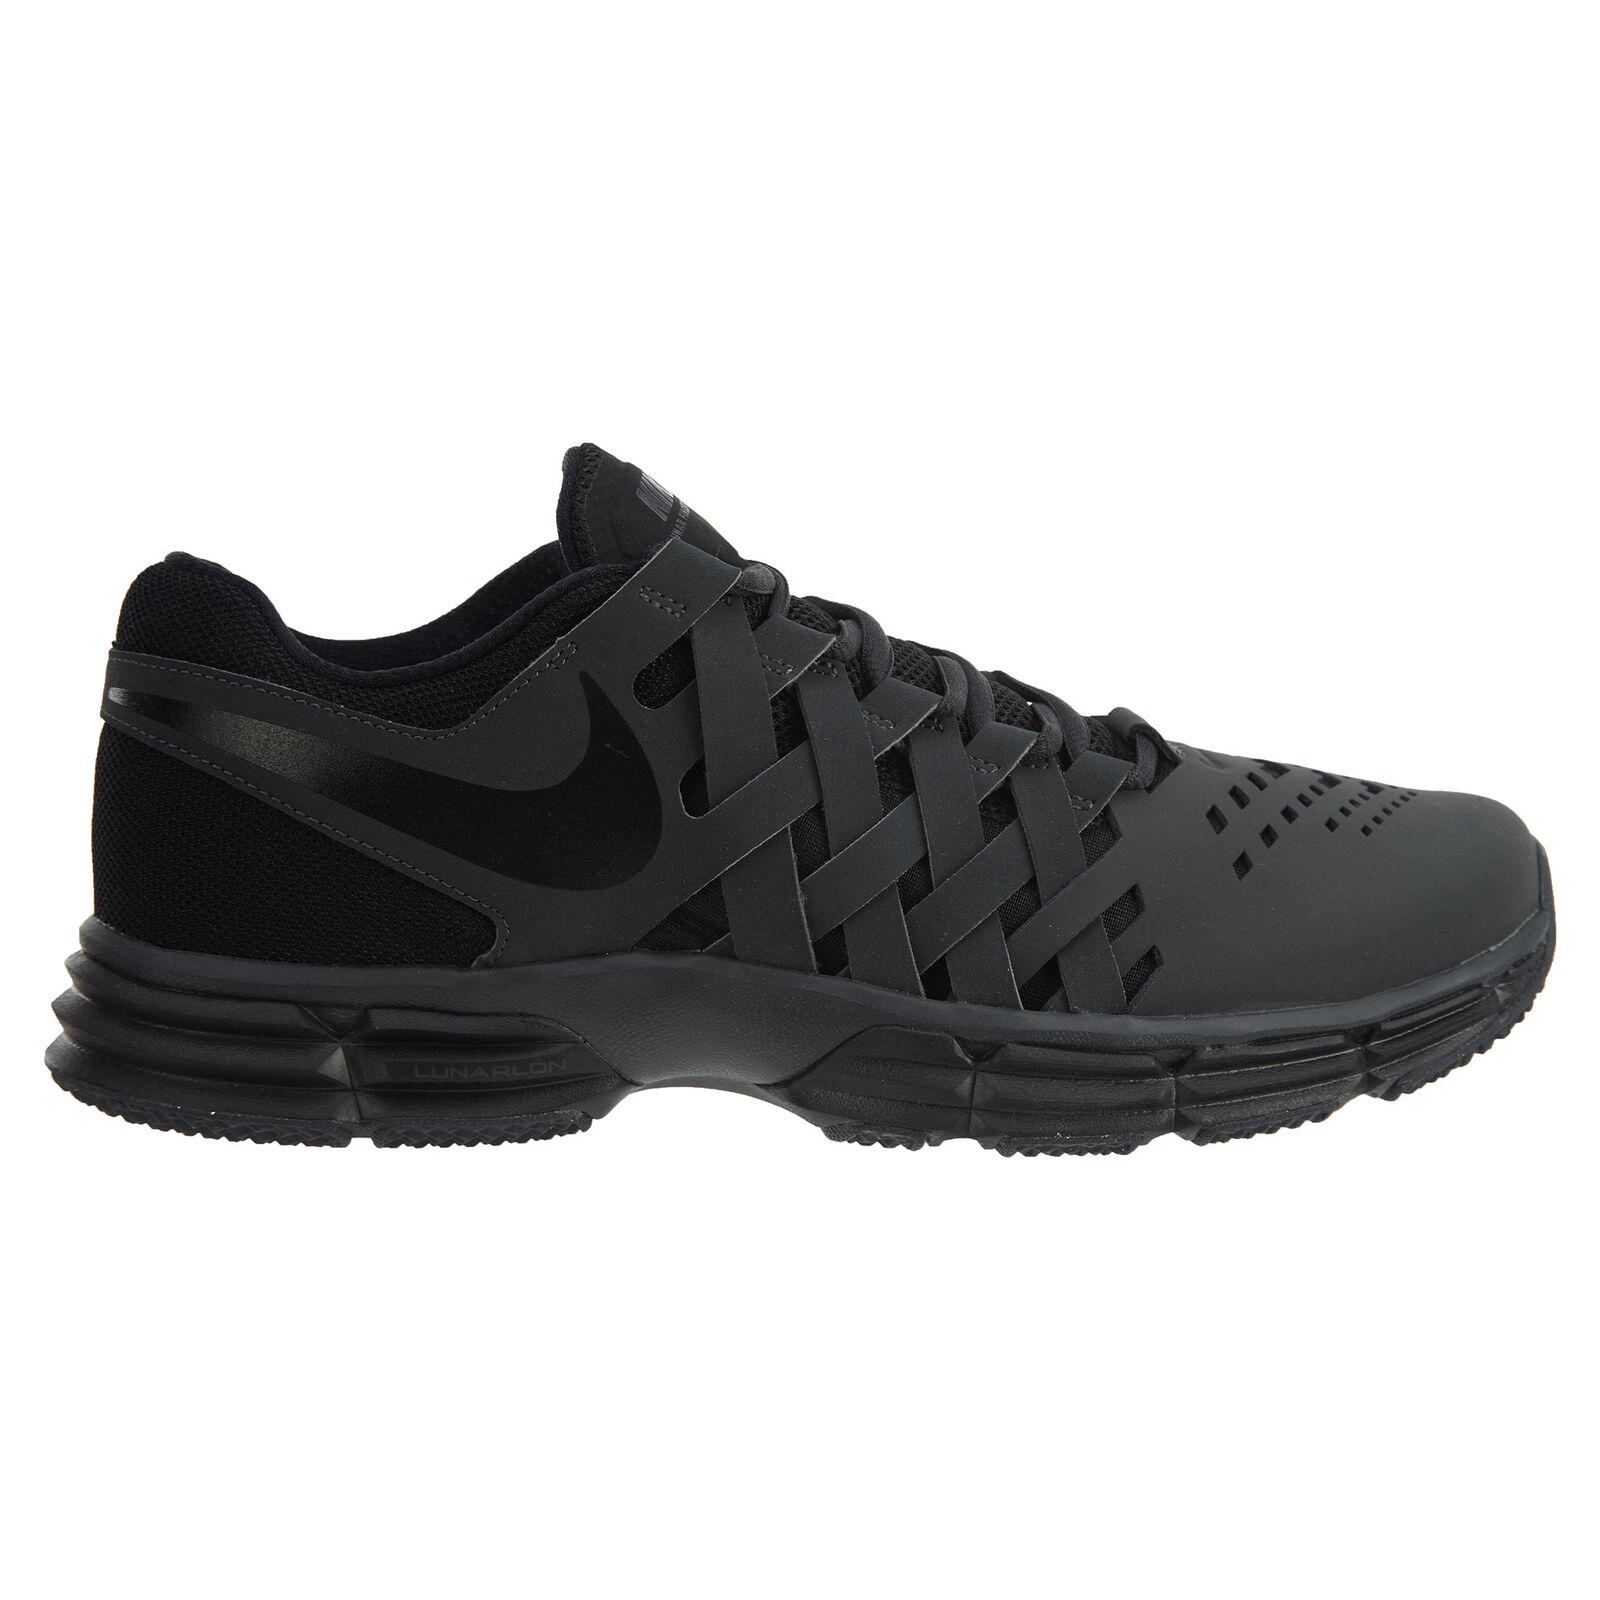 Nike Lunar Anthracite Fingertrap TR Mens 898066-010 Anthracite Lunar Black Training Shoes Size 11 e29b63